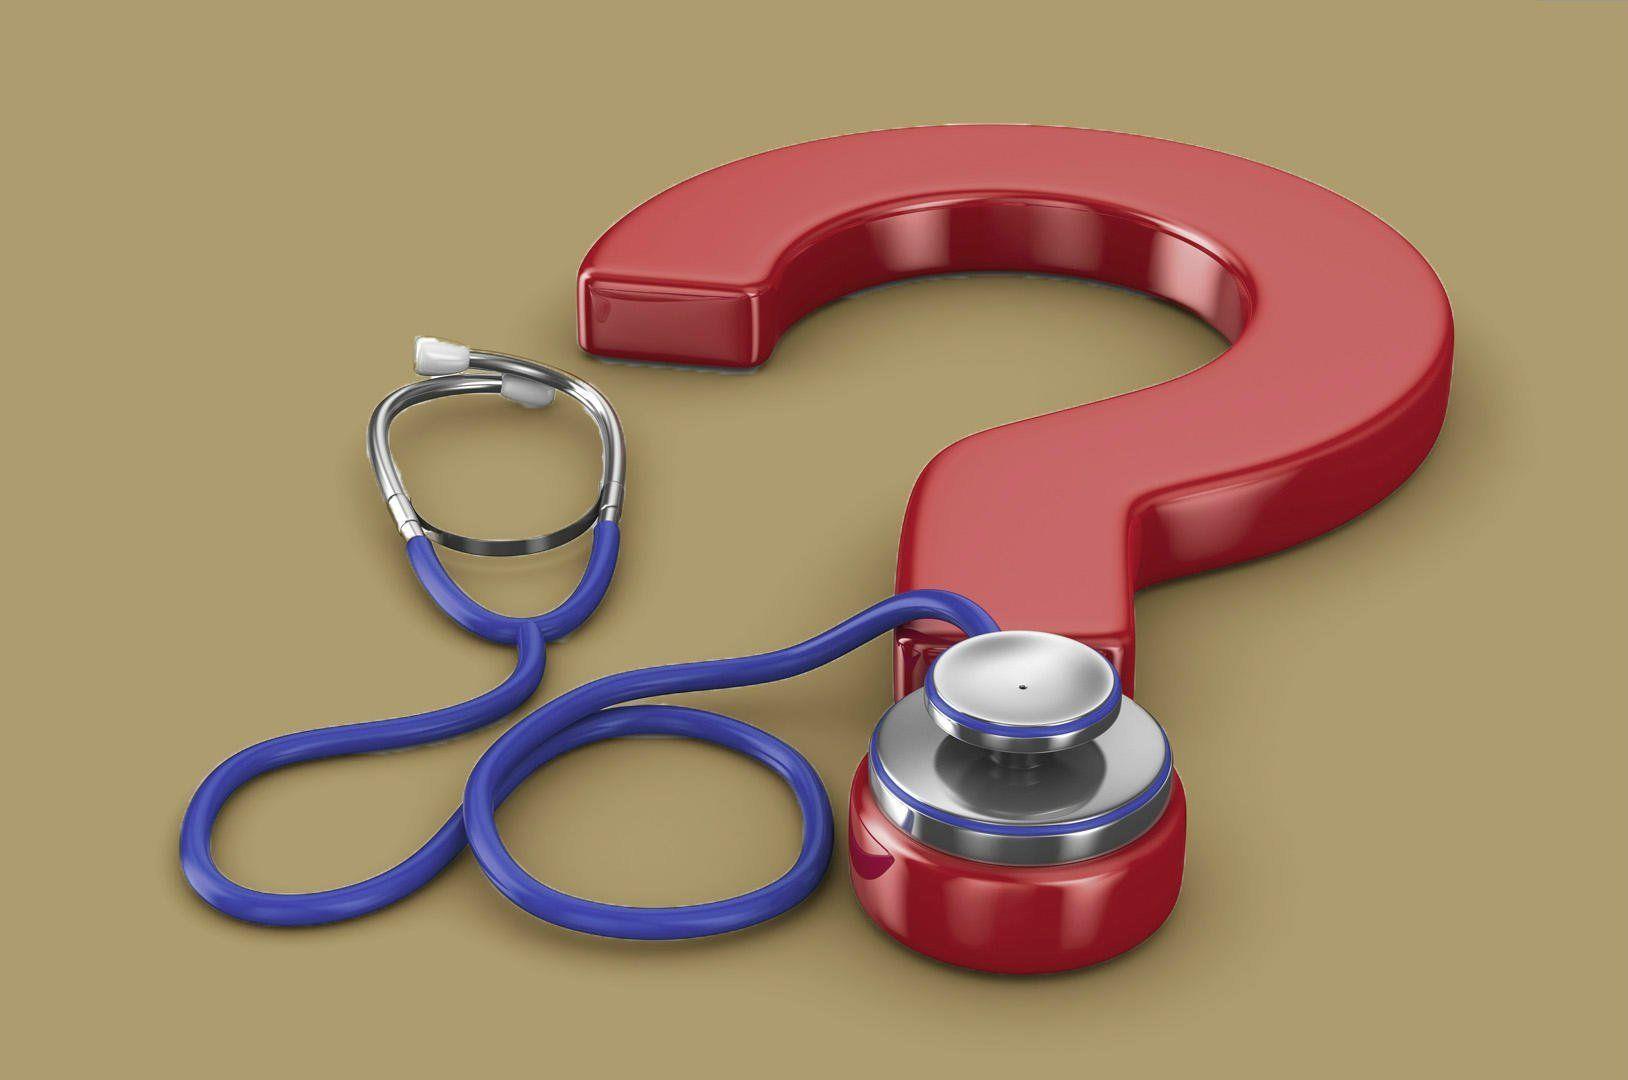 stethoscope_question_mark_177122457_med-medical